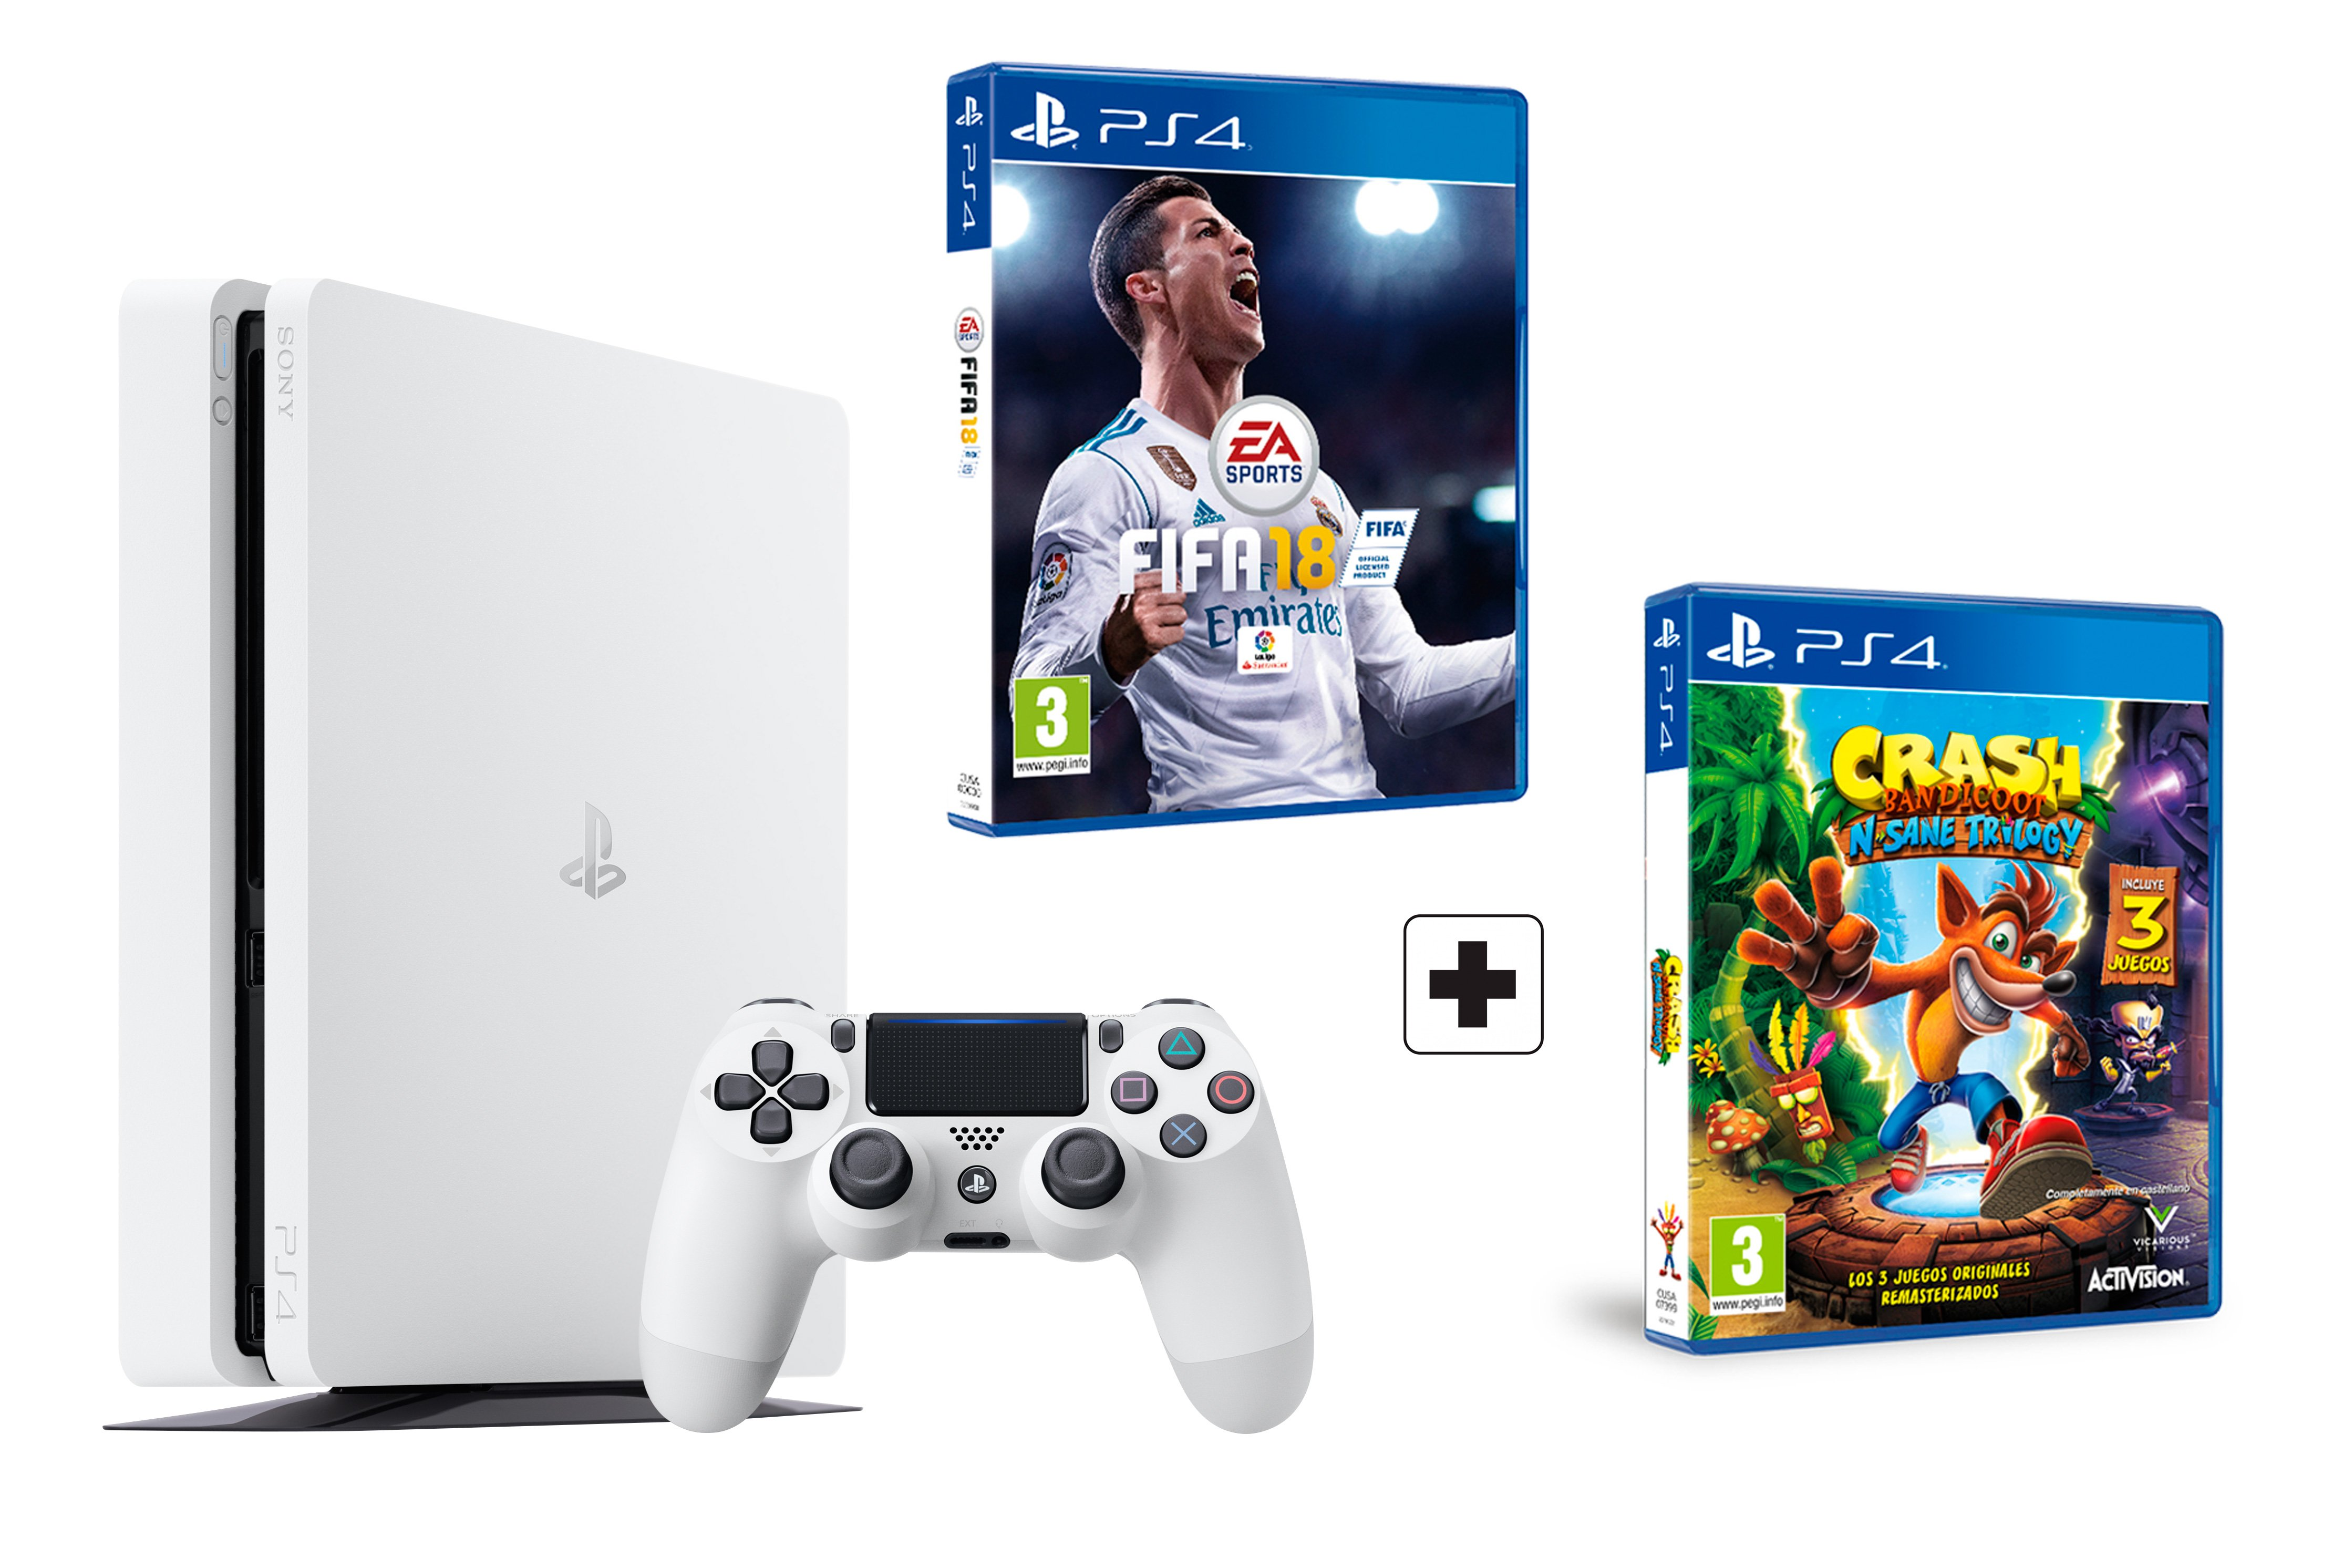 ps4 slim blanca consola 500gb pack 2 juegos fifa 18 crash bandicoot trilogy ebay. Black Bedroom Furniture Sets. Home Design Ideas